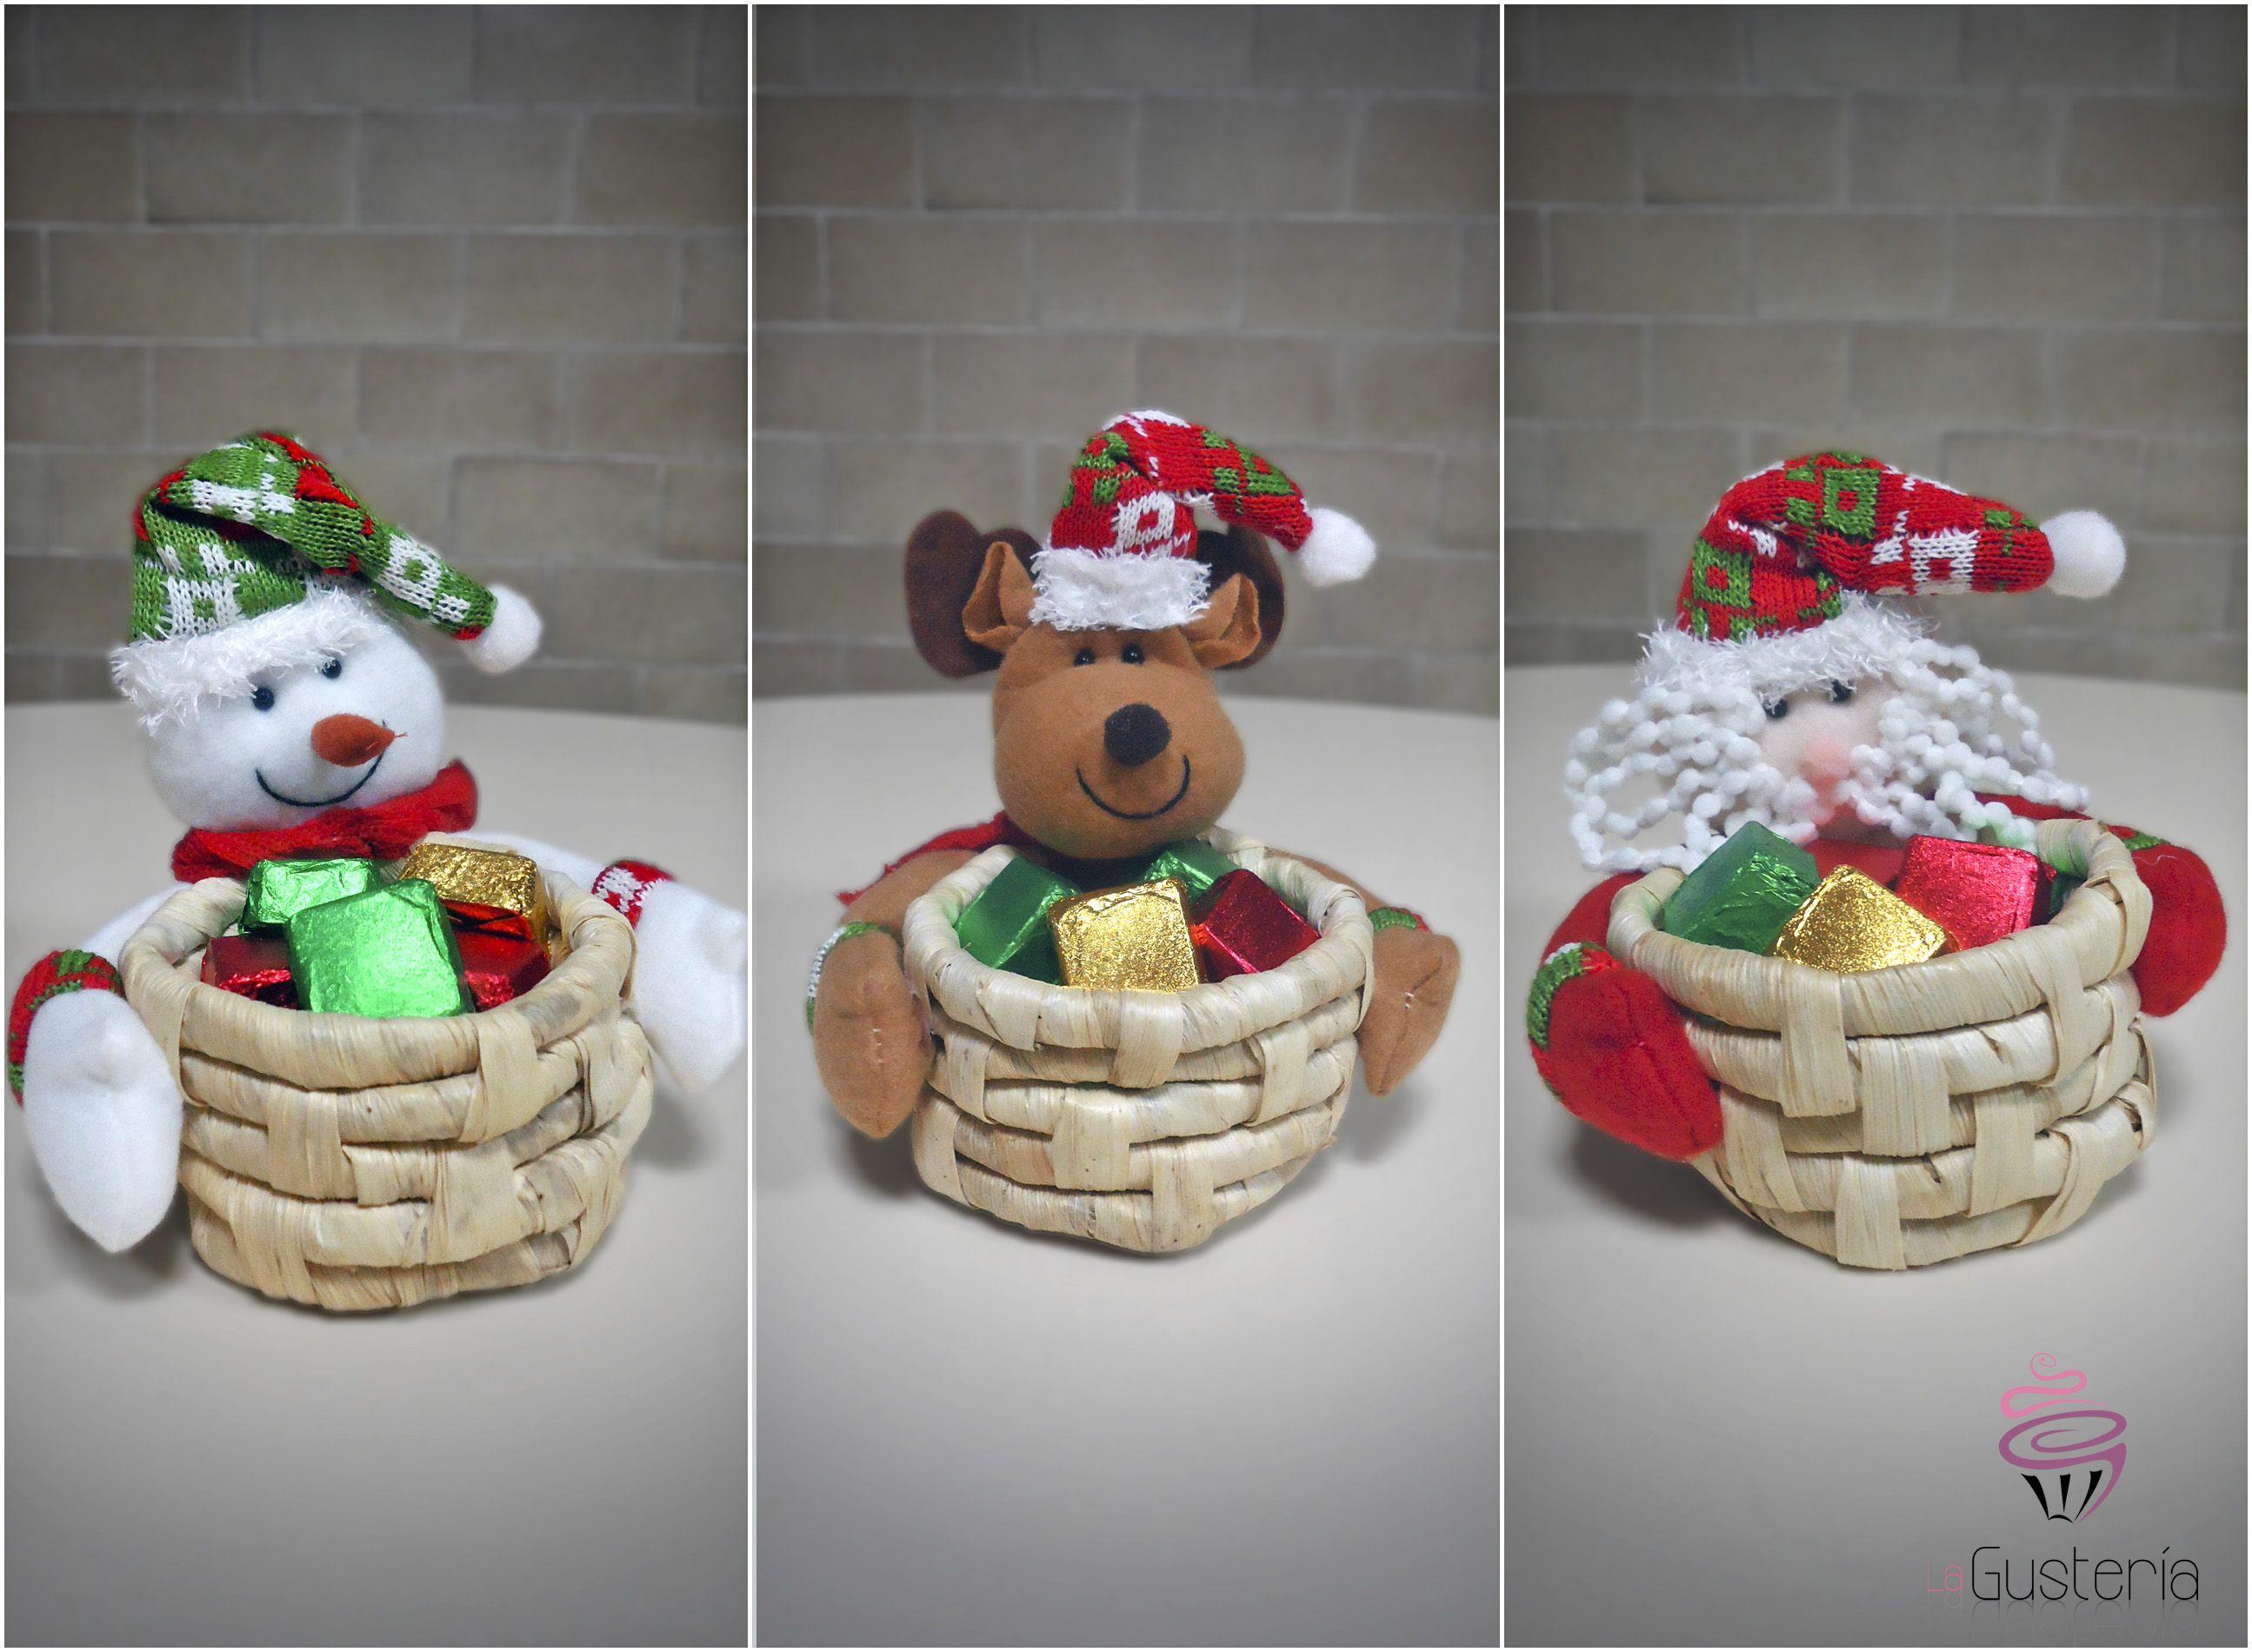 Canastas navide as de chocolates peque as canastas con 10 - Canastas de mimbre decoradas ...